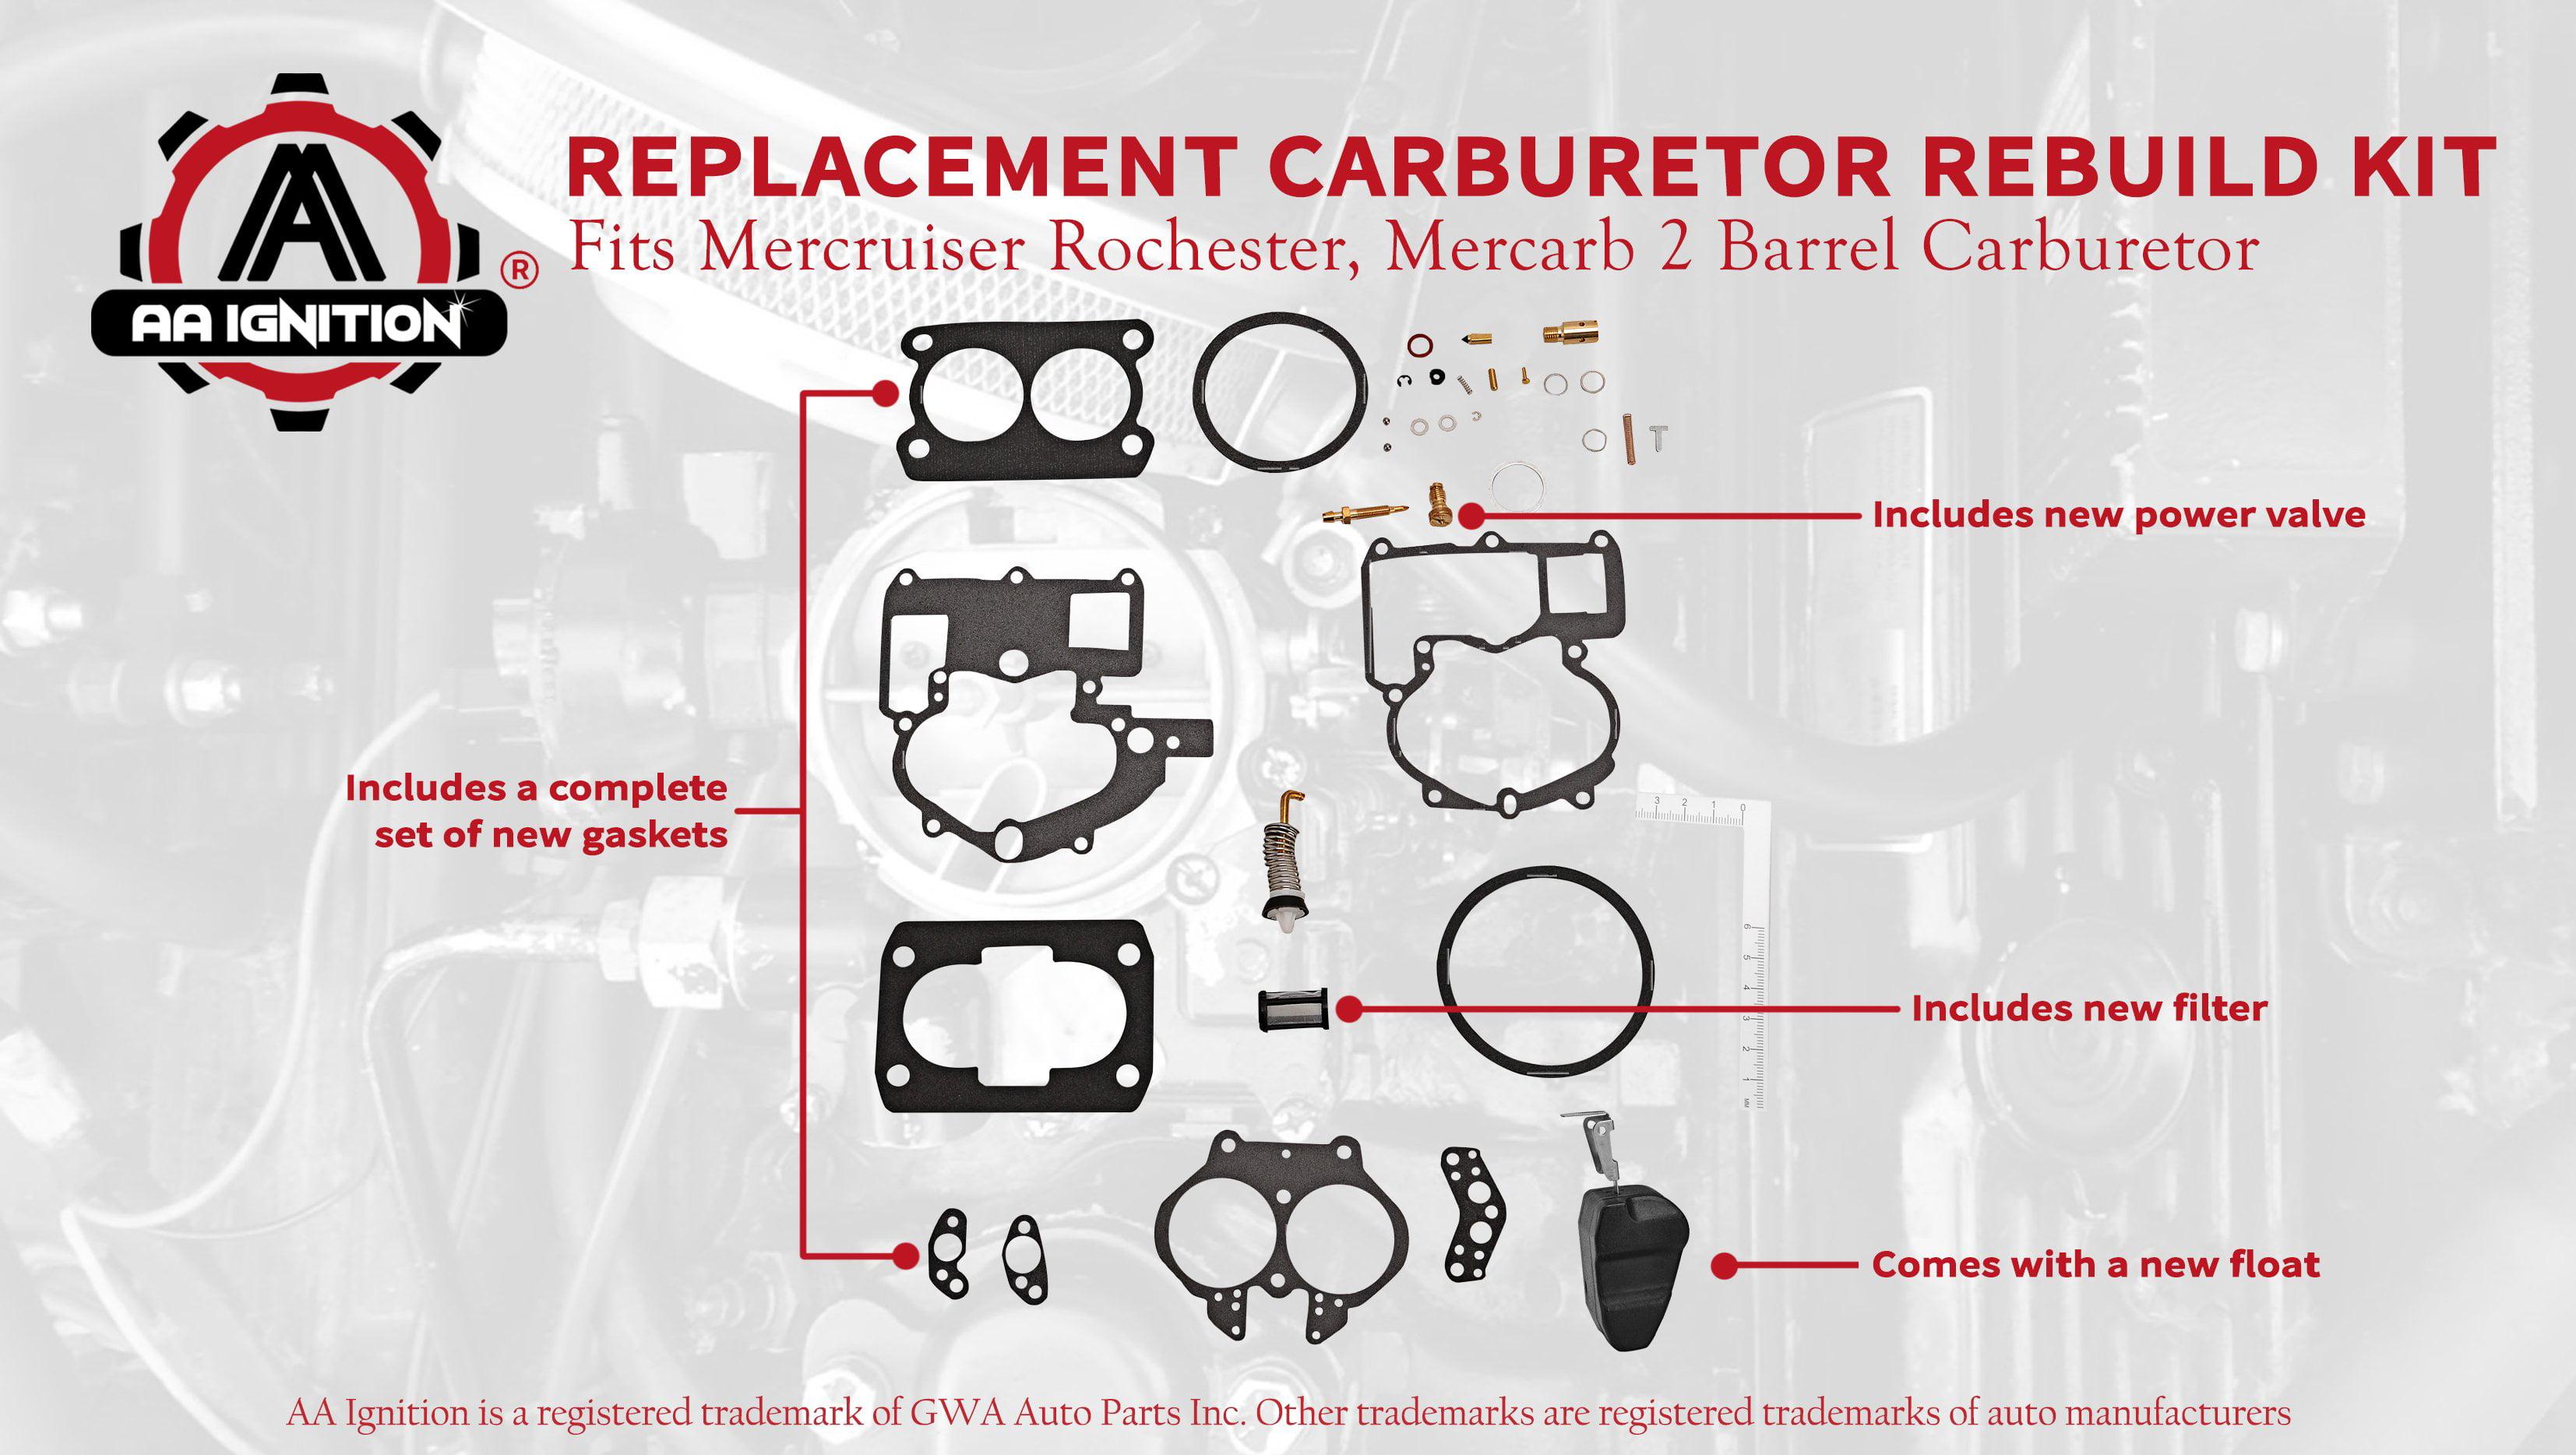 Alpha 76086 5.7L Mercury Replacement Mercruiser Rochester 2 Barrel Carb Rebuild Kit with Float 9-37612 GM Replaces 3302-804844 4.3L Bravo Engines Fits 2.5L 3.0L 18-7098 50844 5.0L